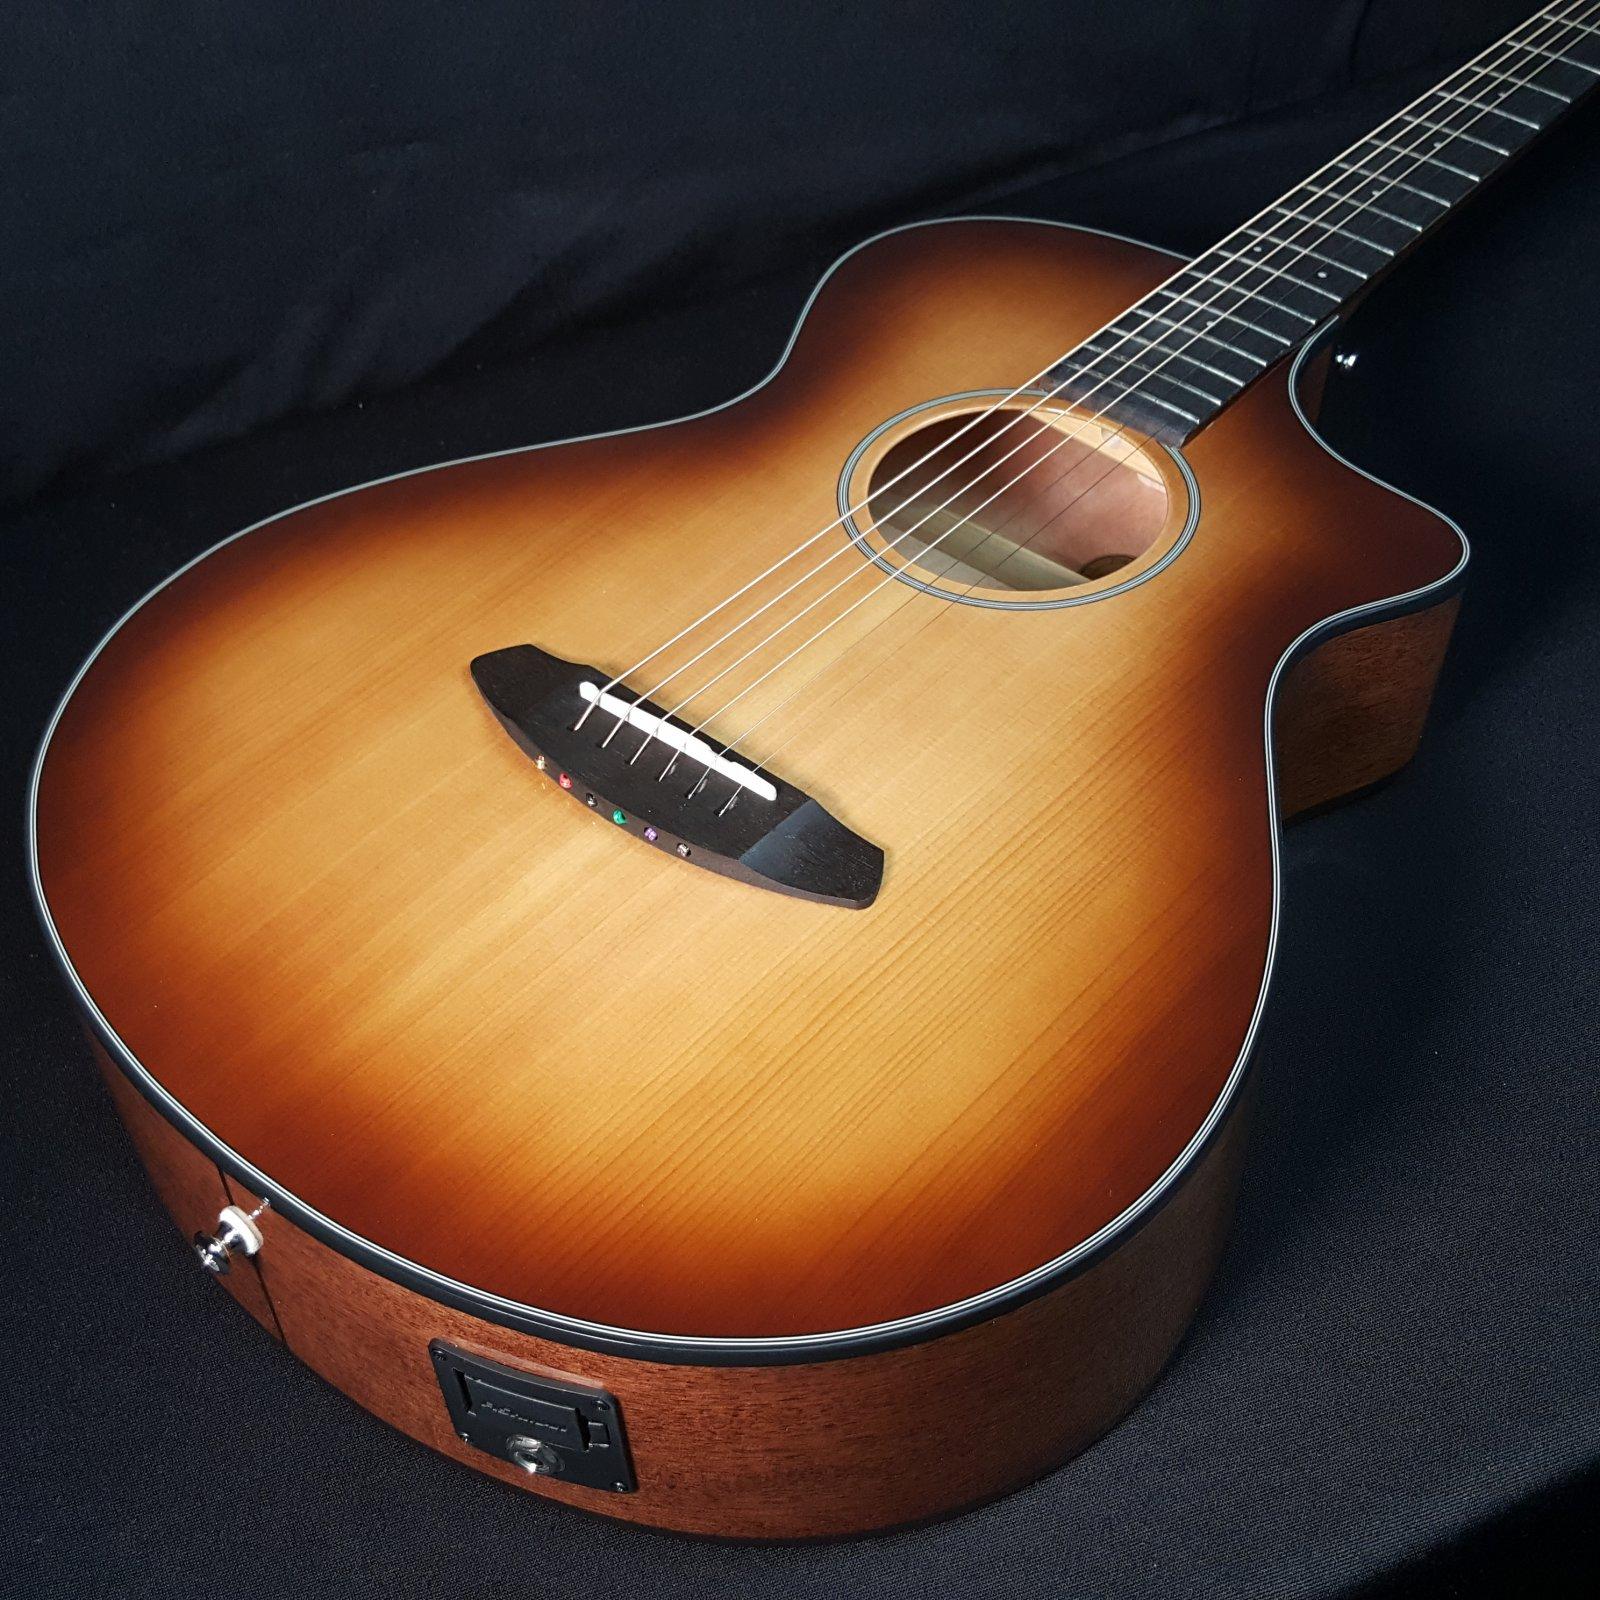 Breedlove Discovery Concertina CE Acoustic Guitar Sunburst